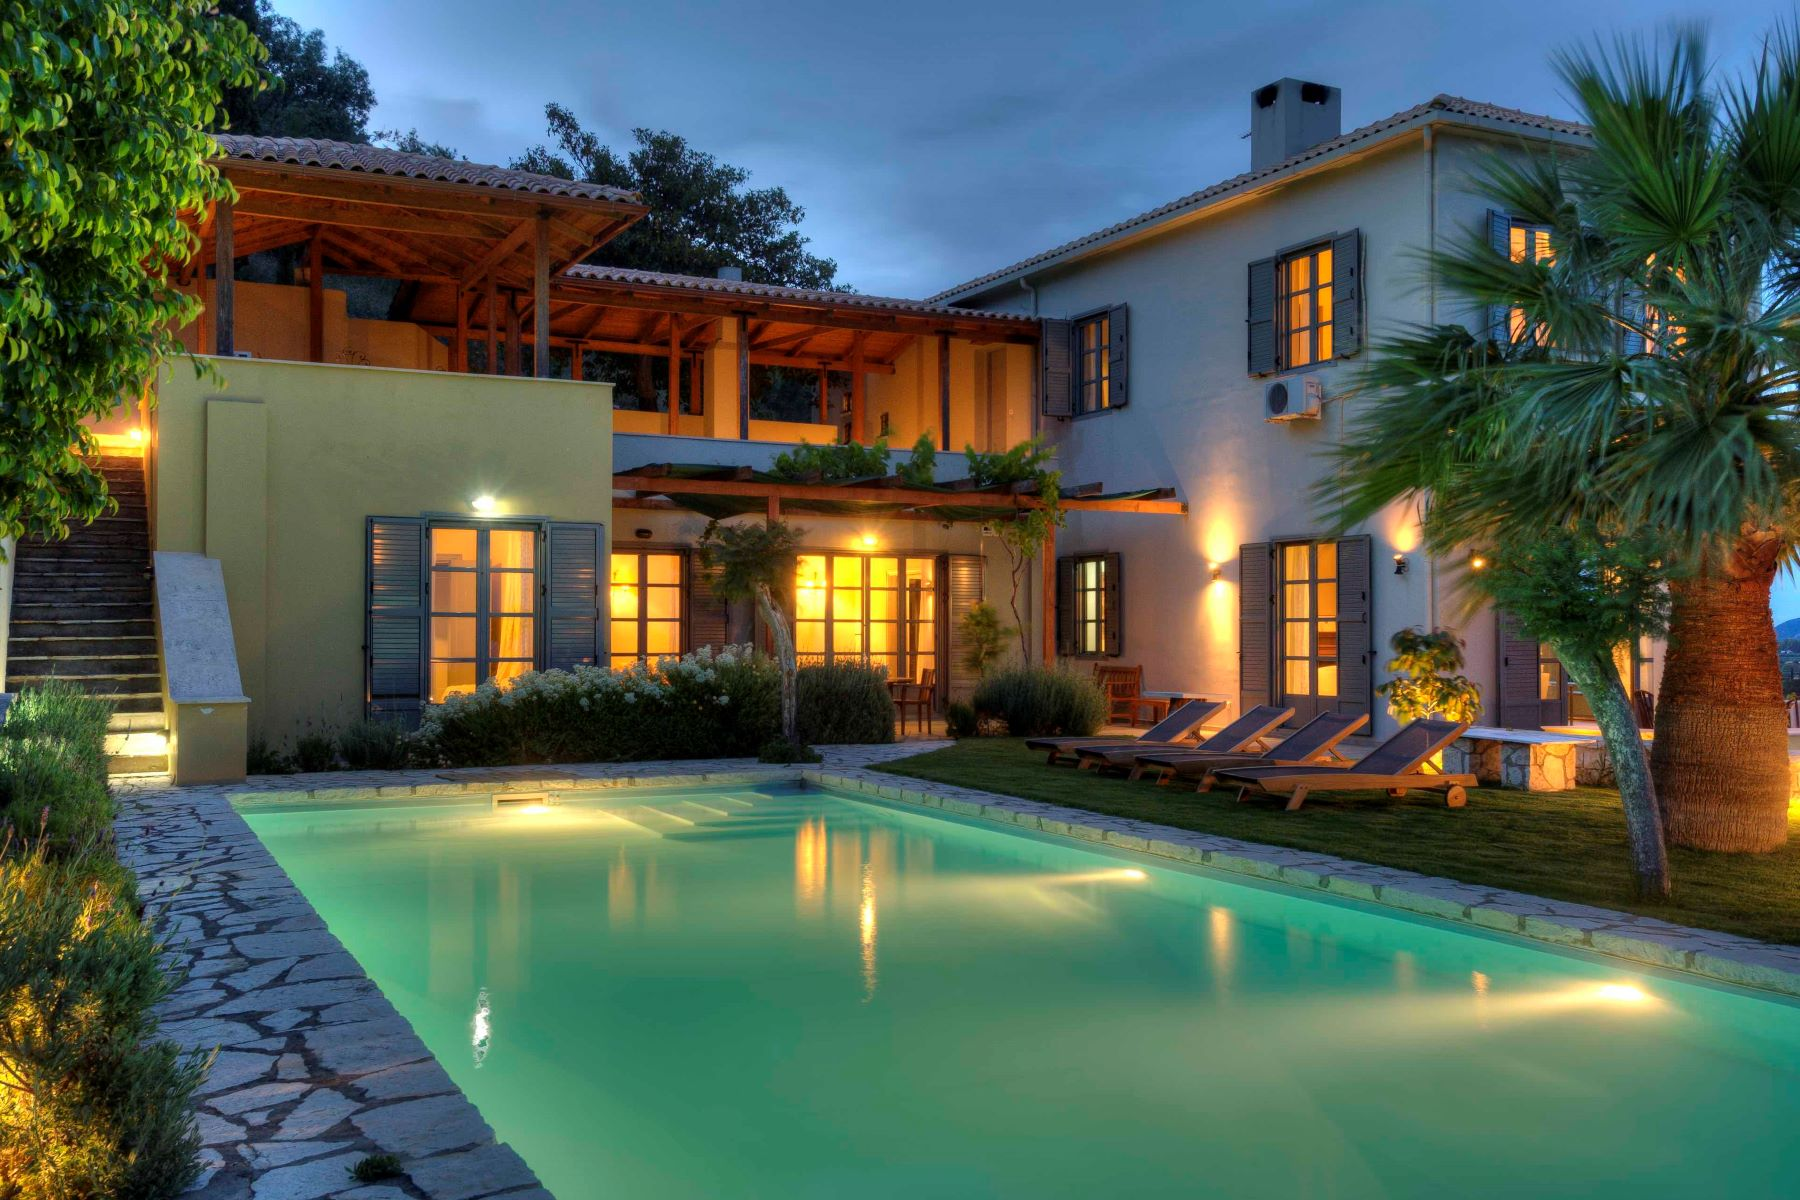 Single Family Homes 为 销售 在 Lithakia Amelia 扎金索斯岛, 伊奥尼亚群岛 29092 希腊